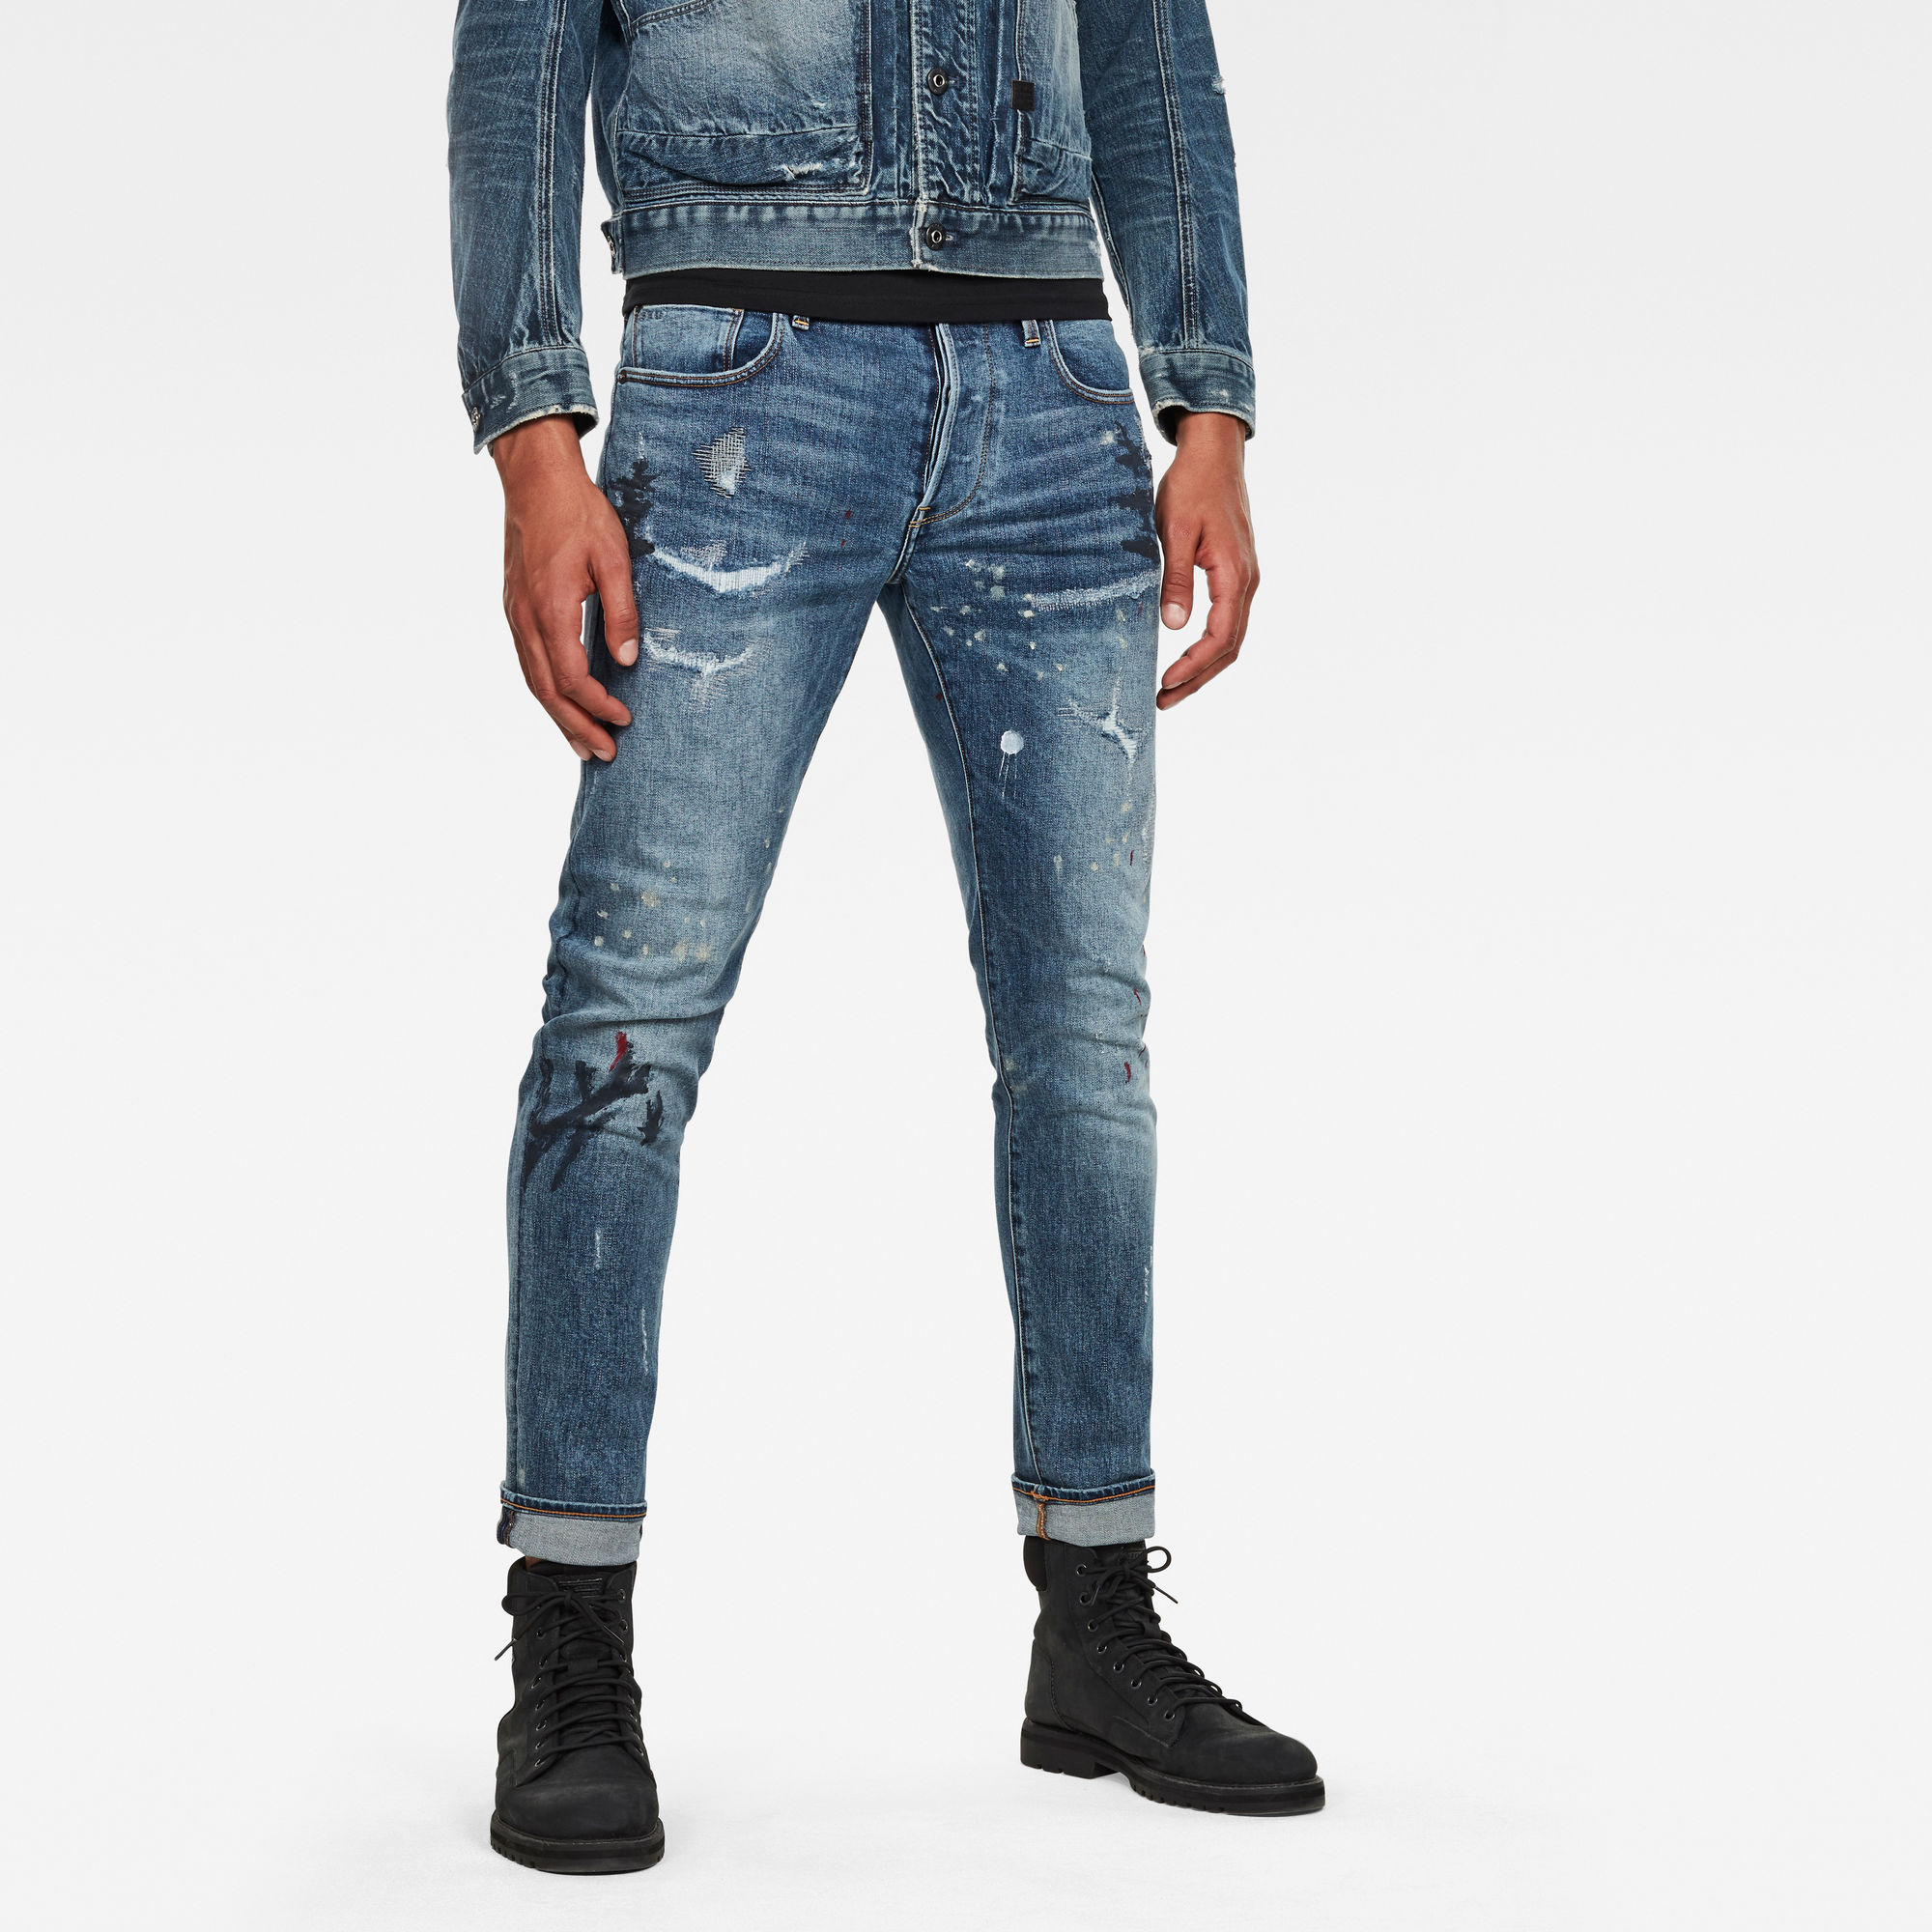 pantalón hombre g-star: Jeans 3301 Slim Azul claro 72